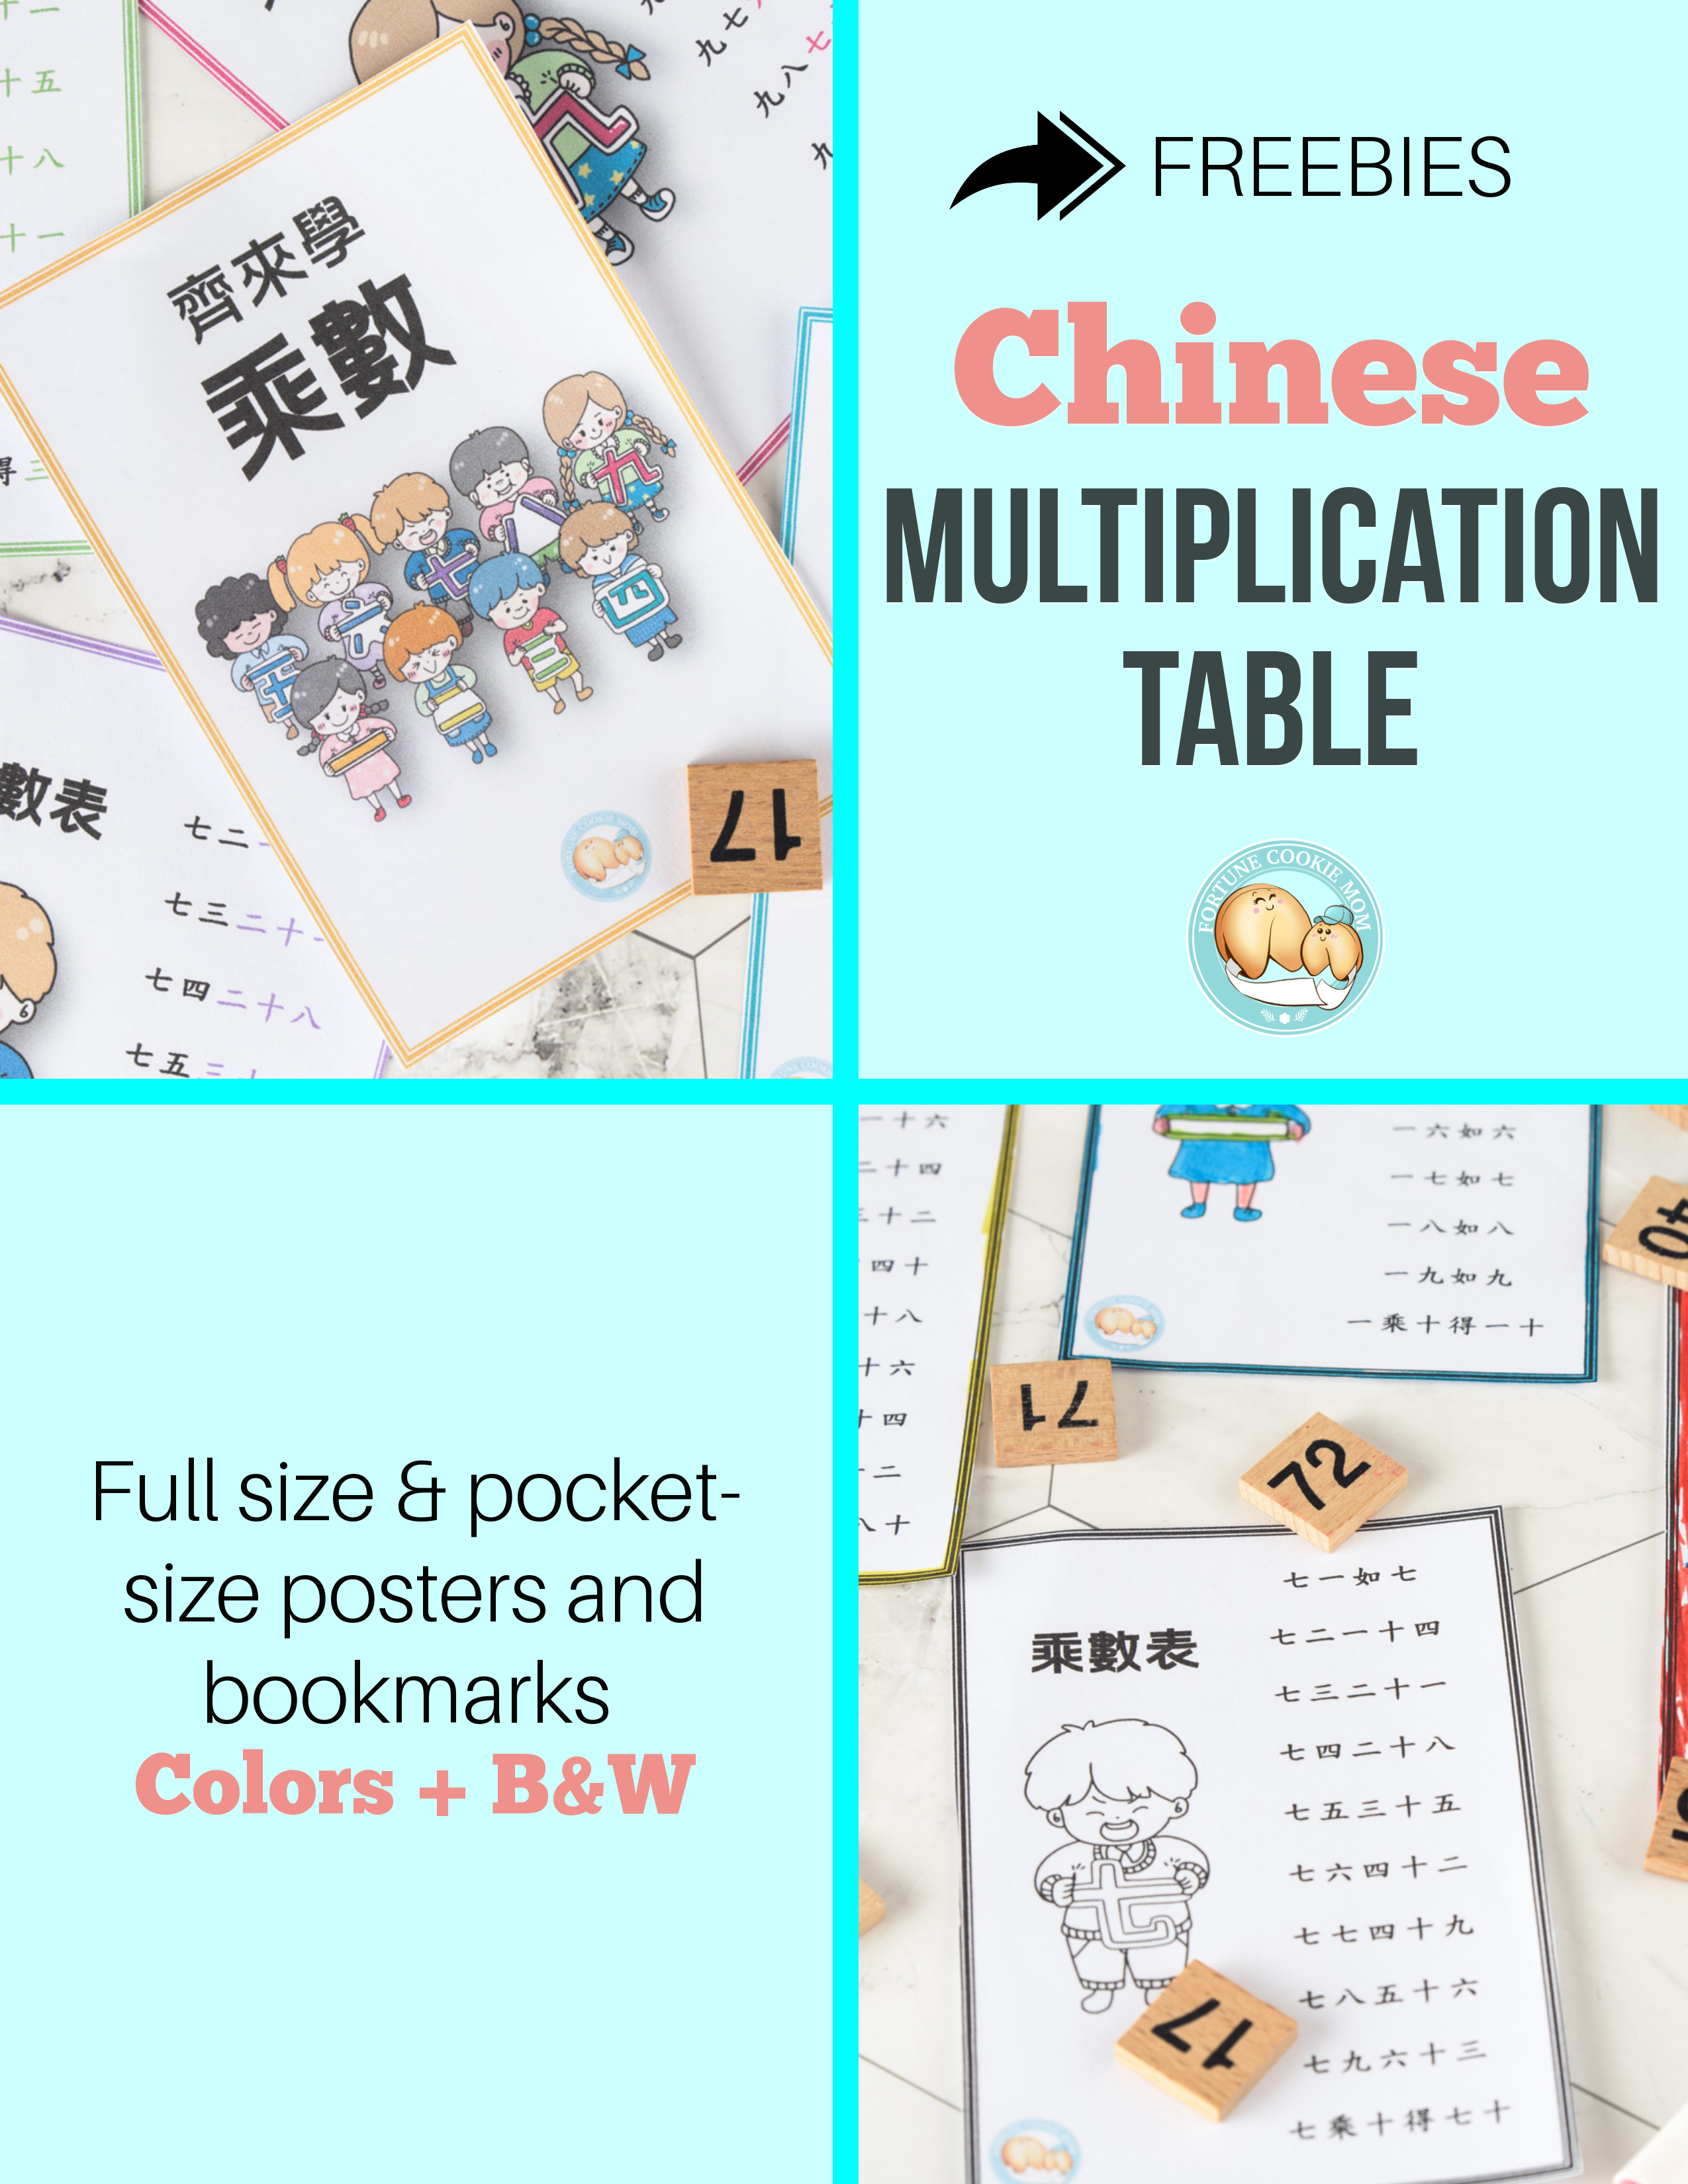 Chinese Multiplication Table Printable Freebie Multiplication Table Printable Printables Freebies Multiplication Table